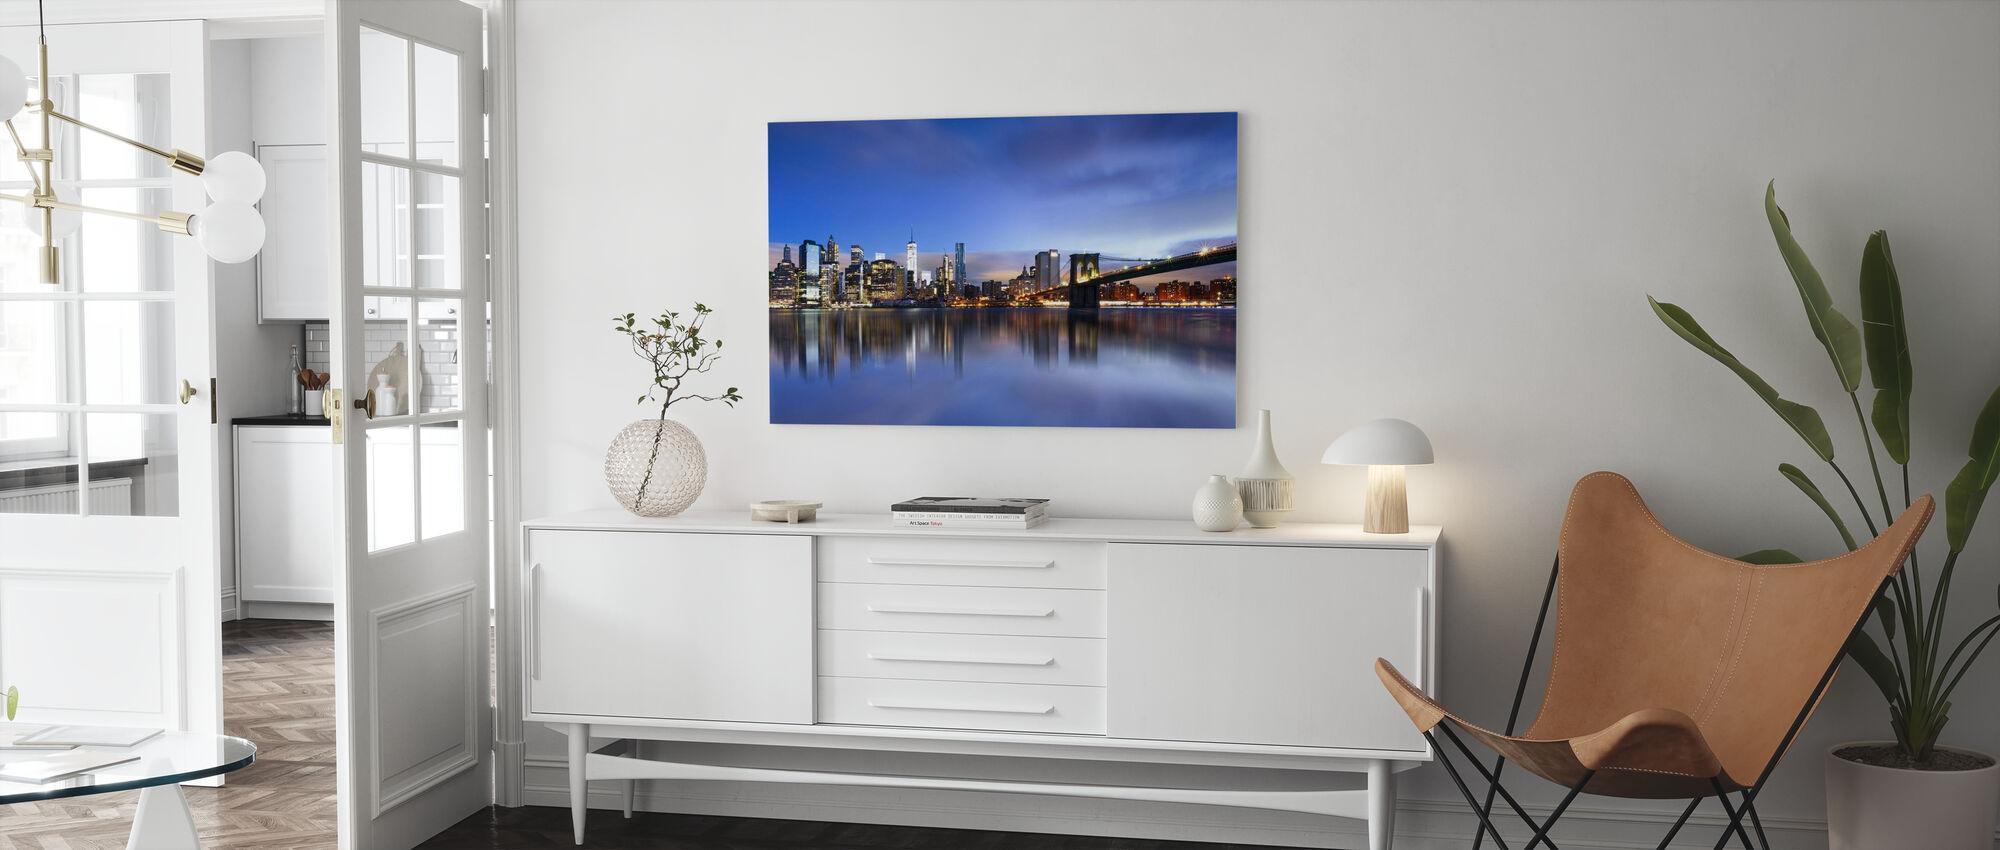 Blue Sunrise over Manhattan - Canvas print - Living Room